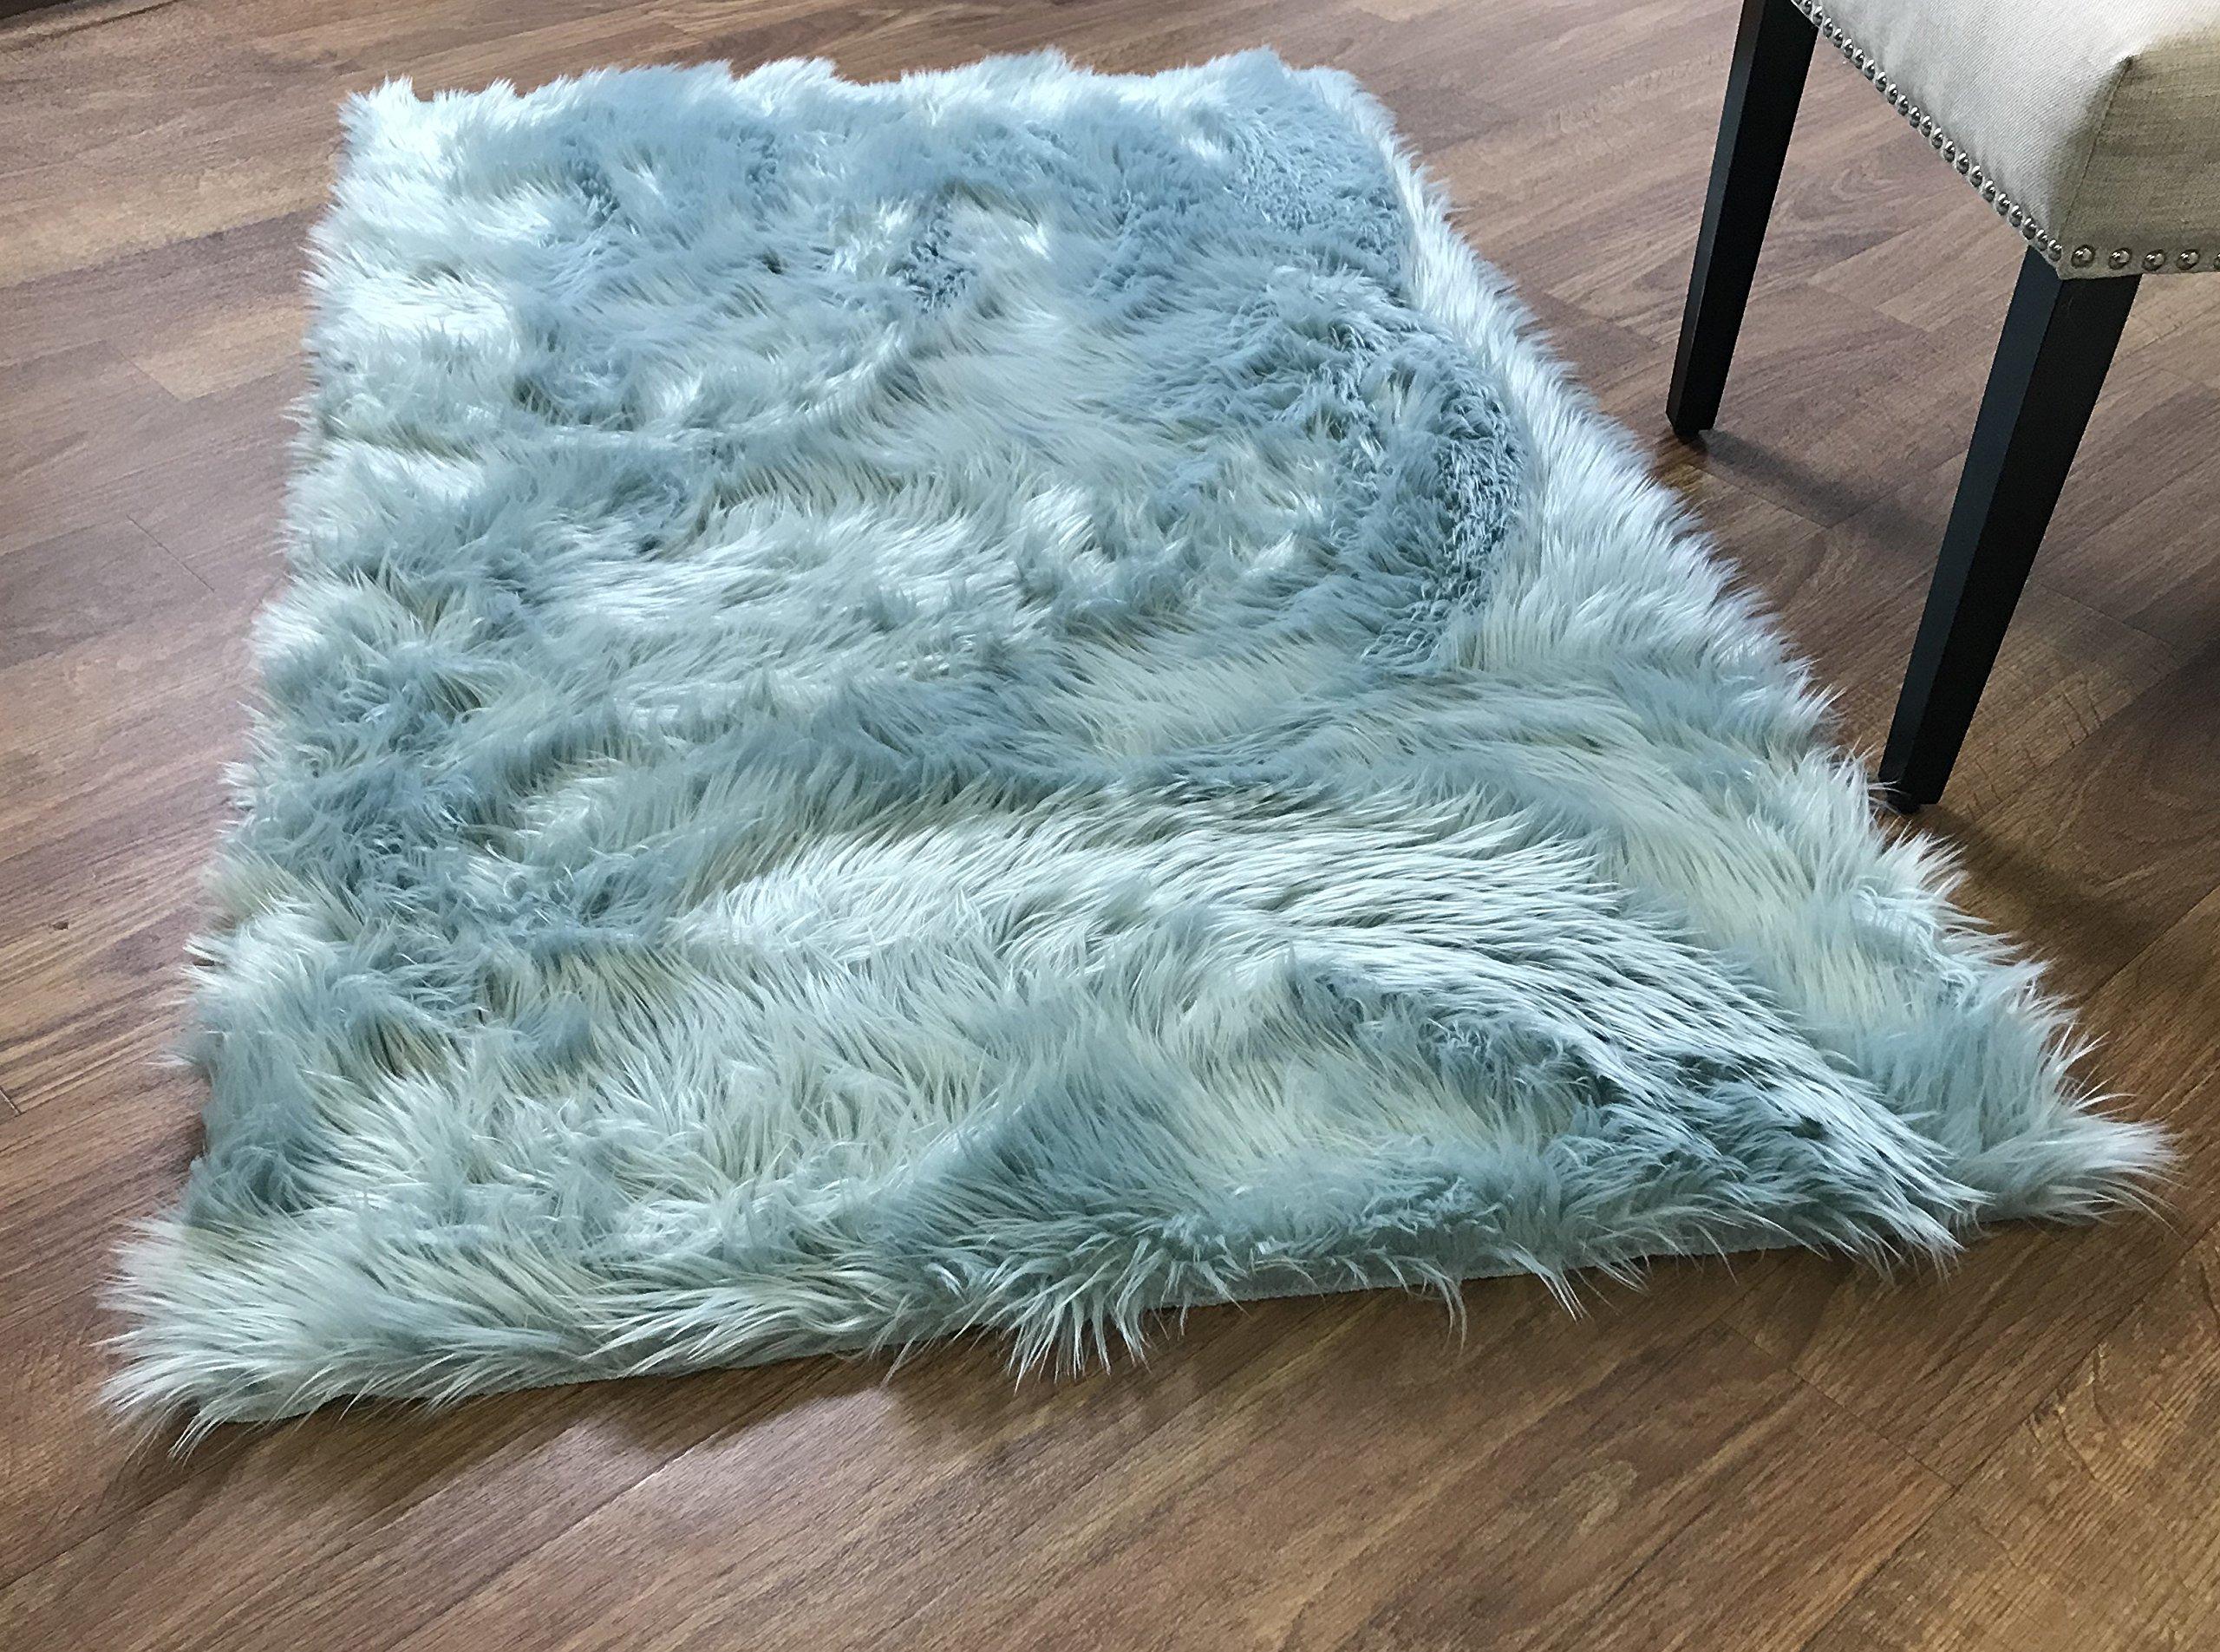 Serene Super Soft Faux Sheepskin Shag Silky Rug Baby Nursery Childrens Room Rug Teal, 5' x 7'